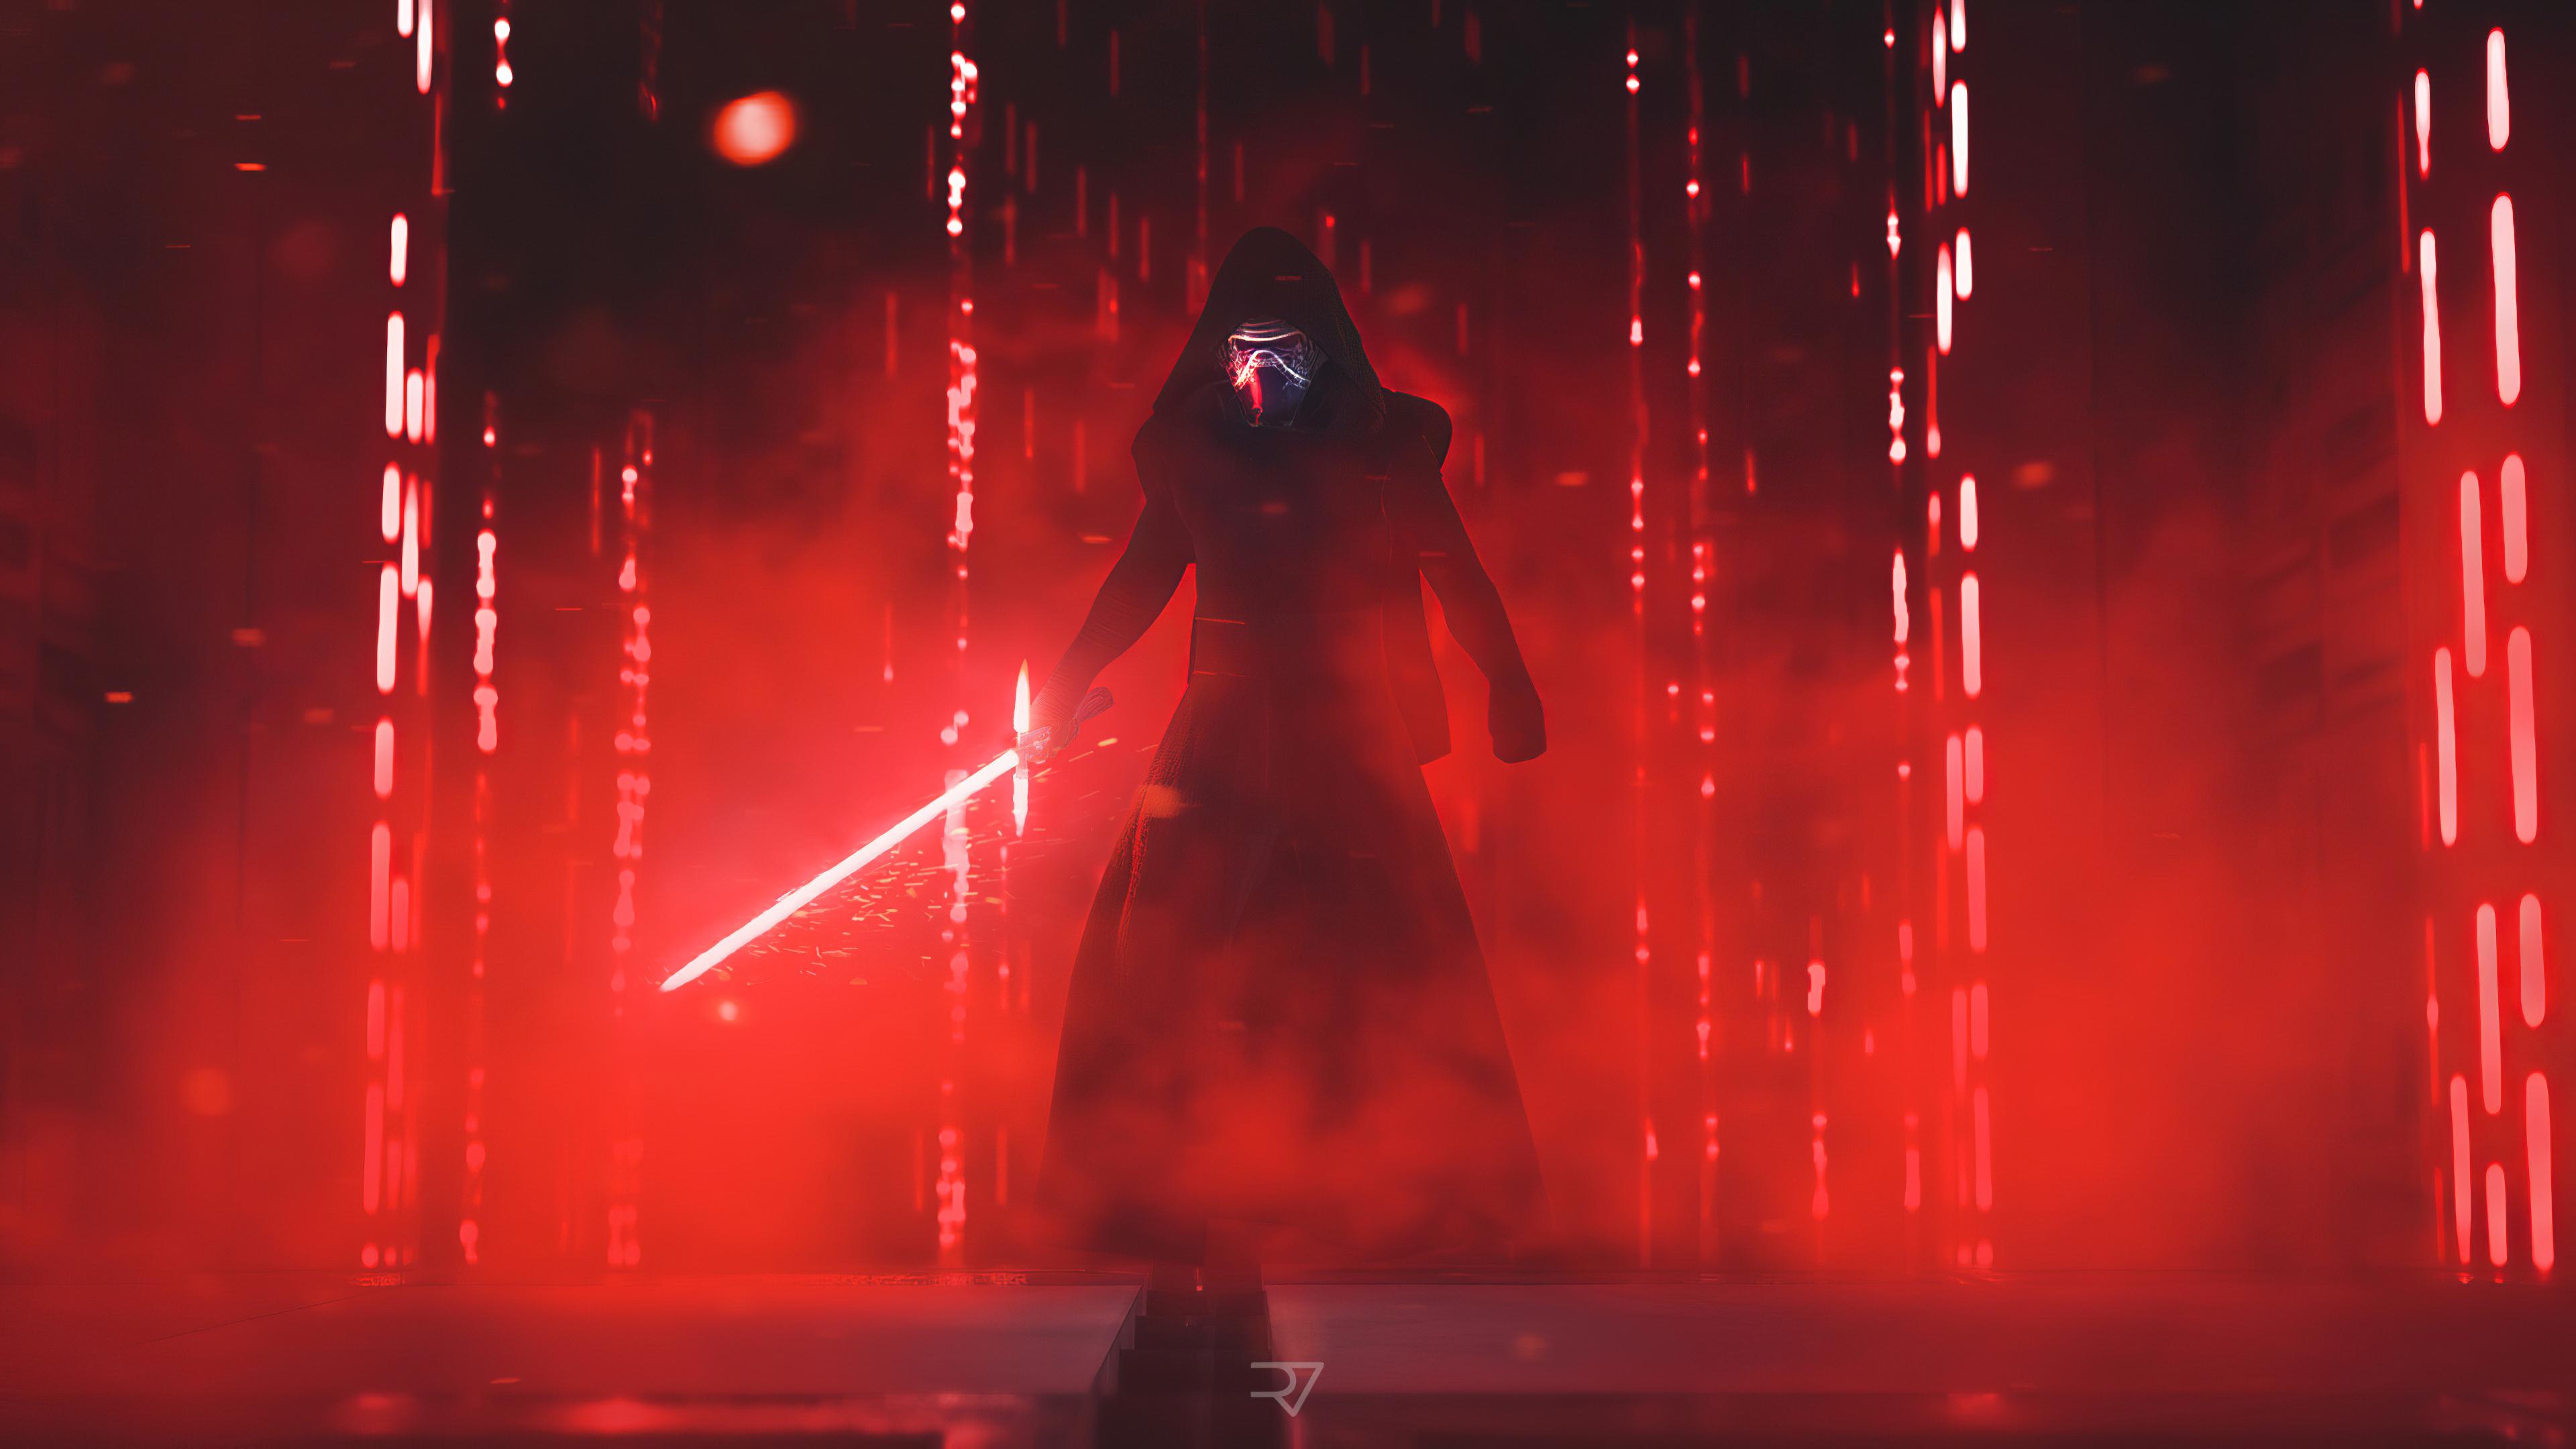 4k Darth Vader 2019 Wallpaper Hd Movies 4k Wallpapers